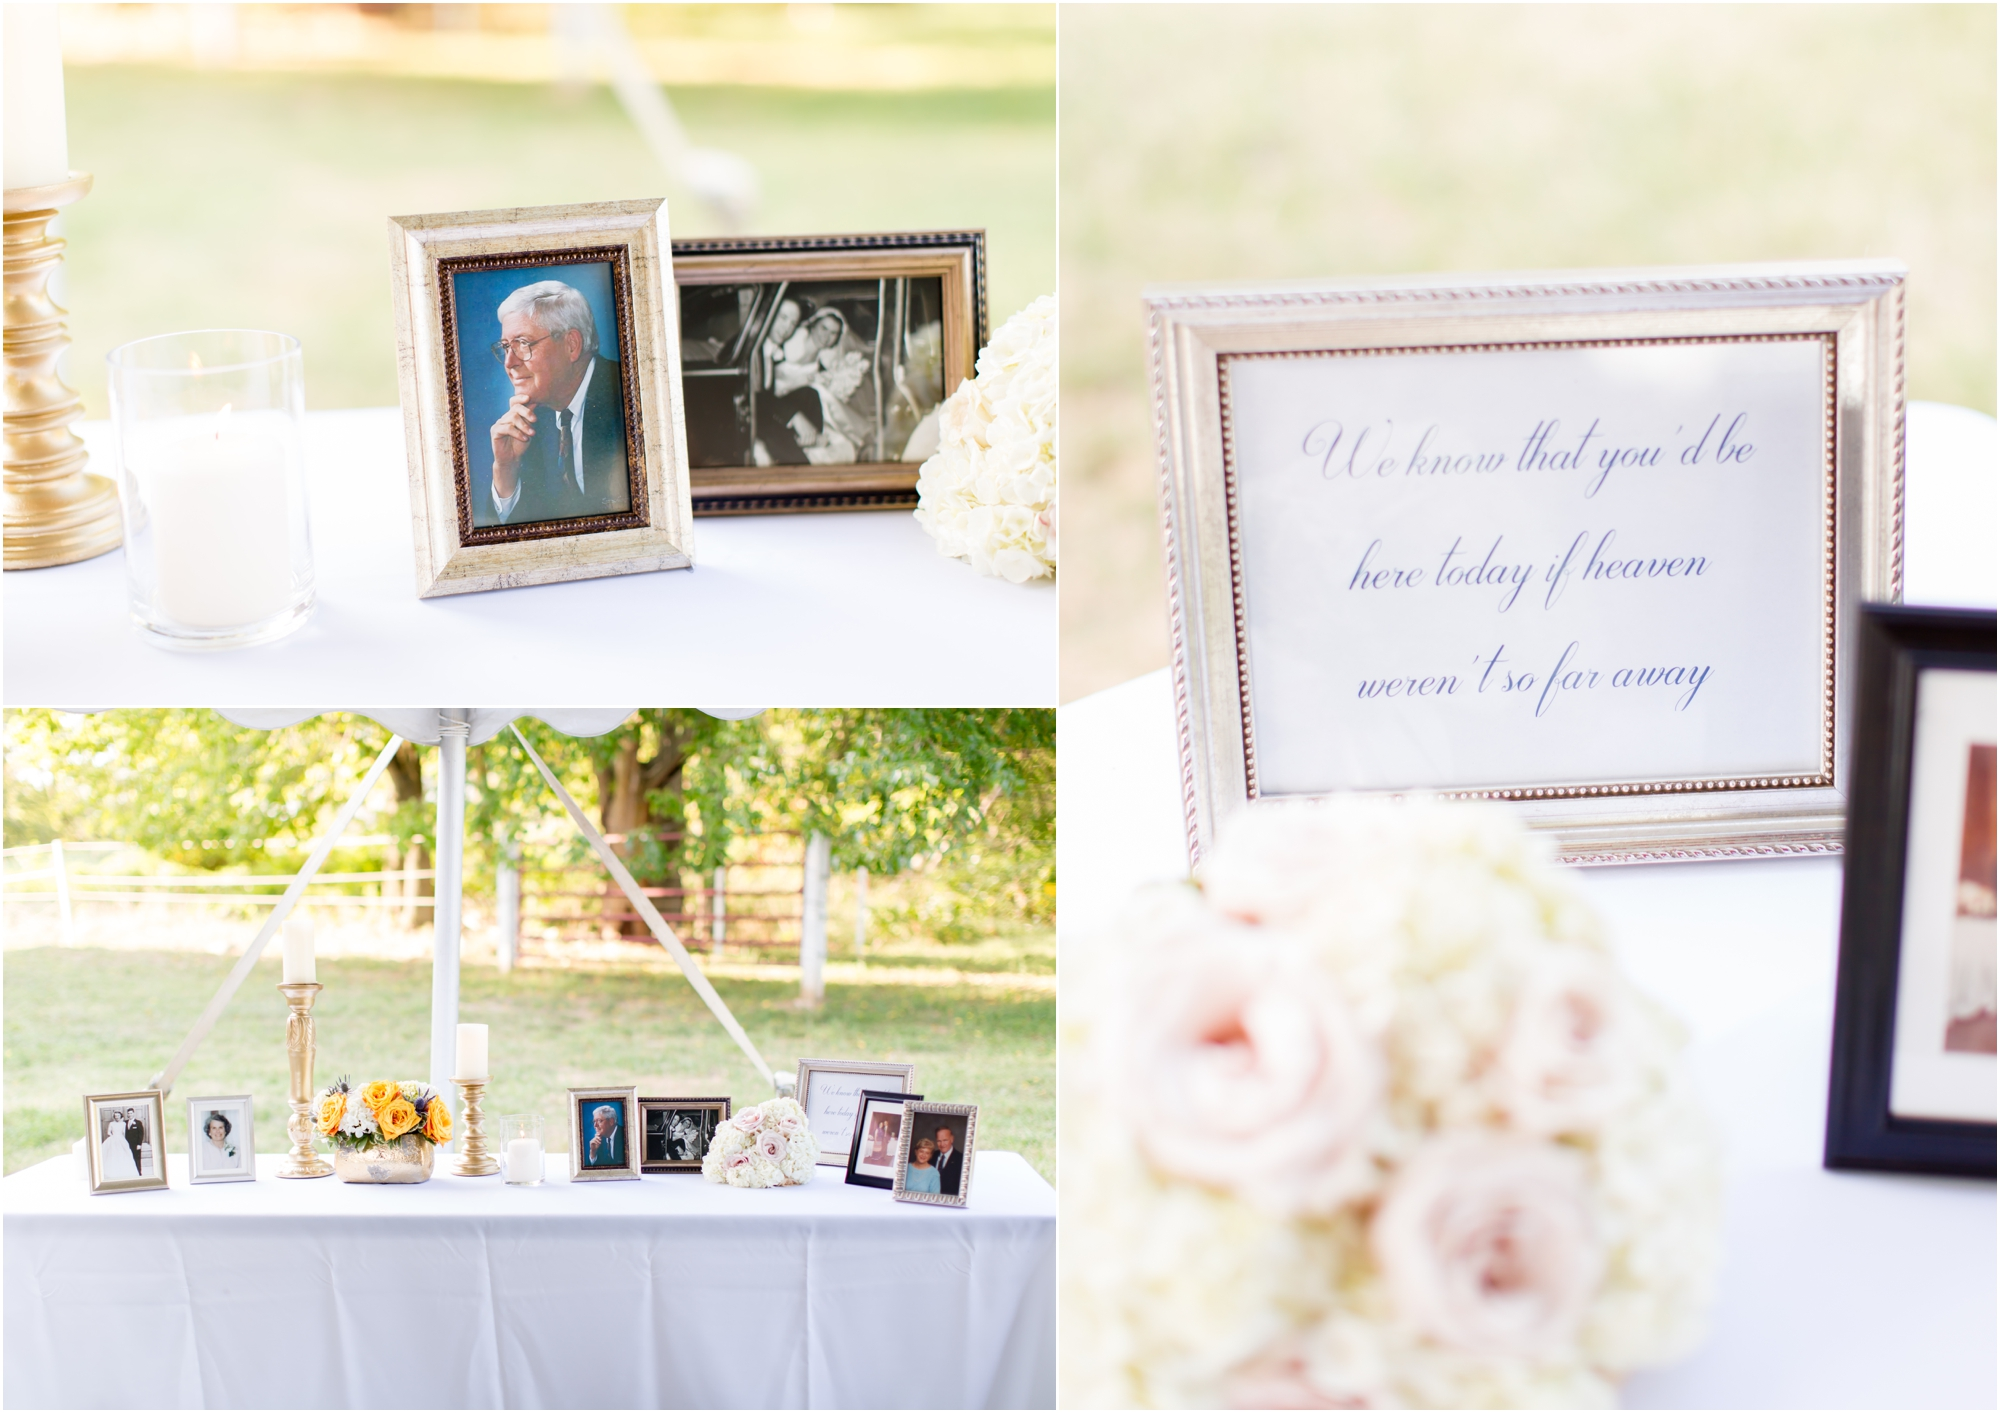 7-Miano Wedding Reception-729_anna grace photography maryland wedding photographer rockland estates.jpg